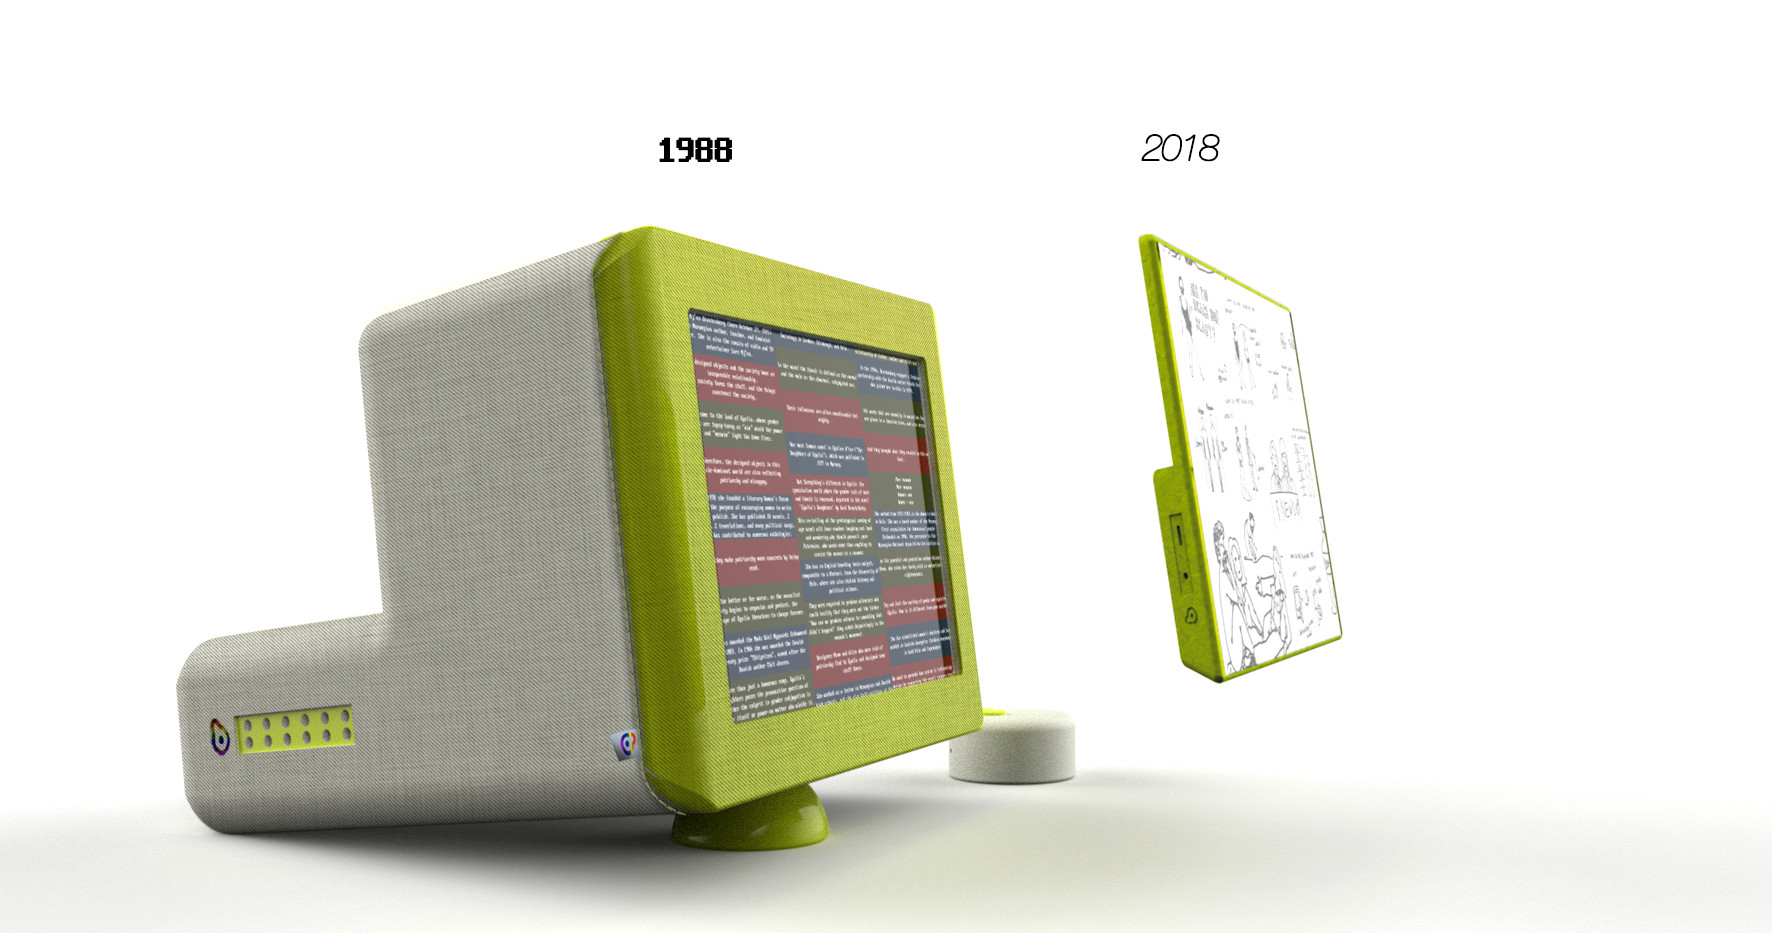 Pear Computer